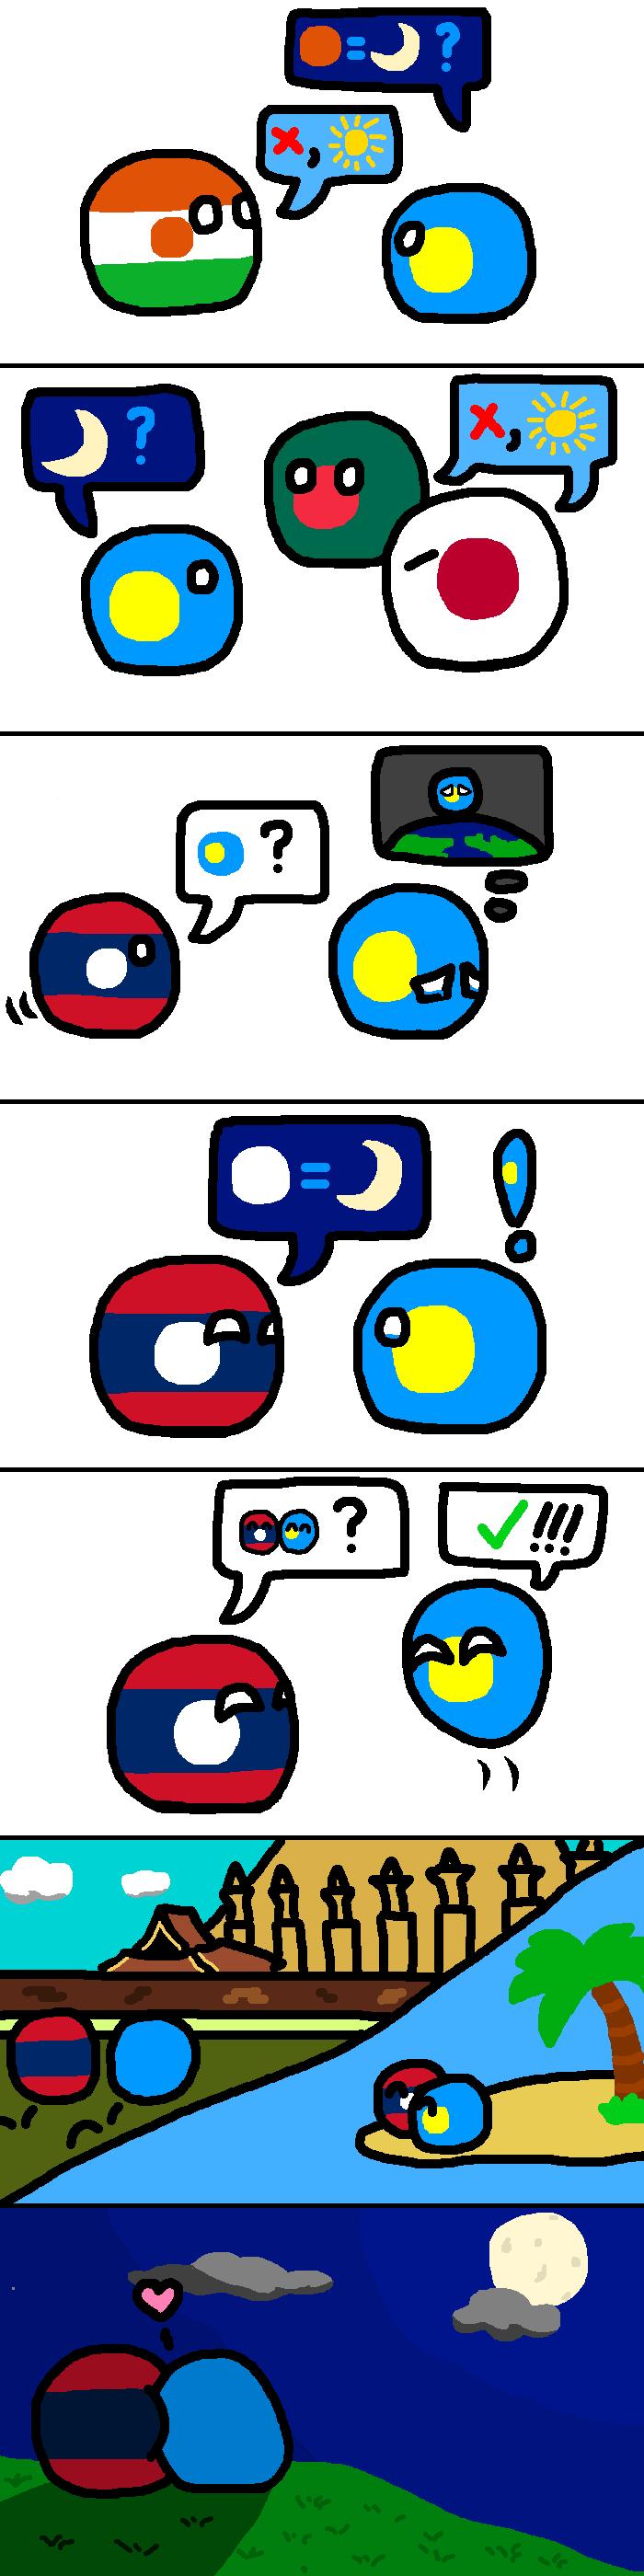 98coidzvq5g61.png